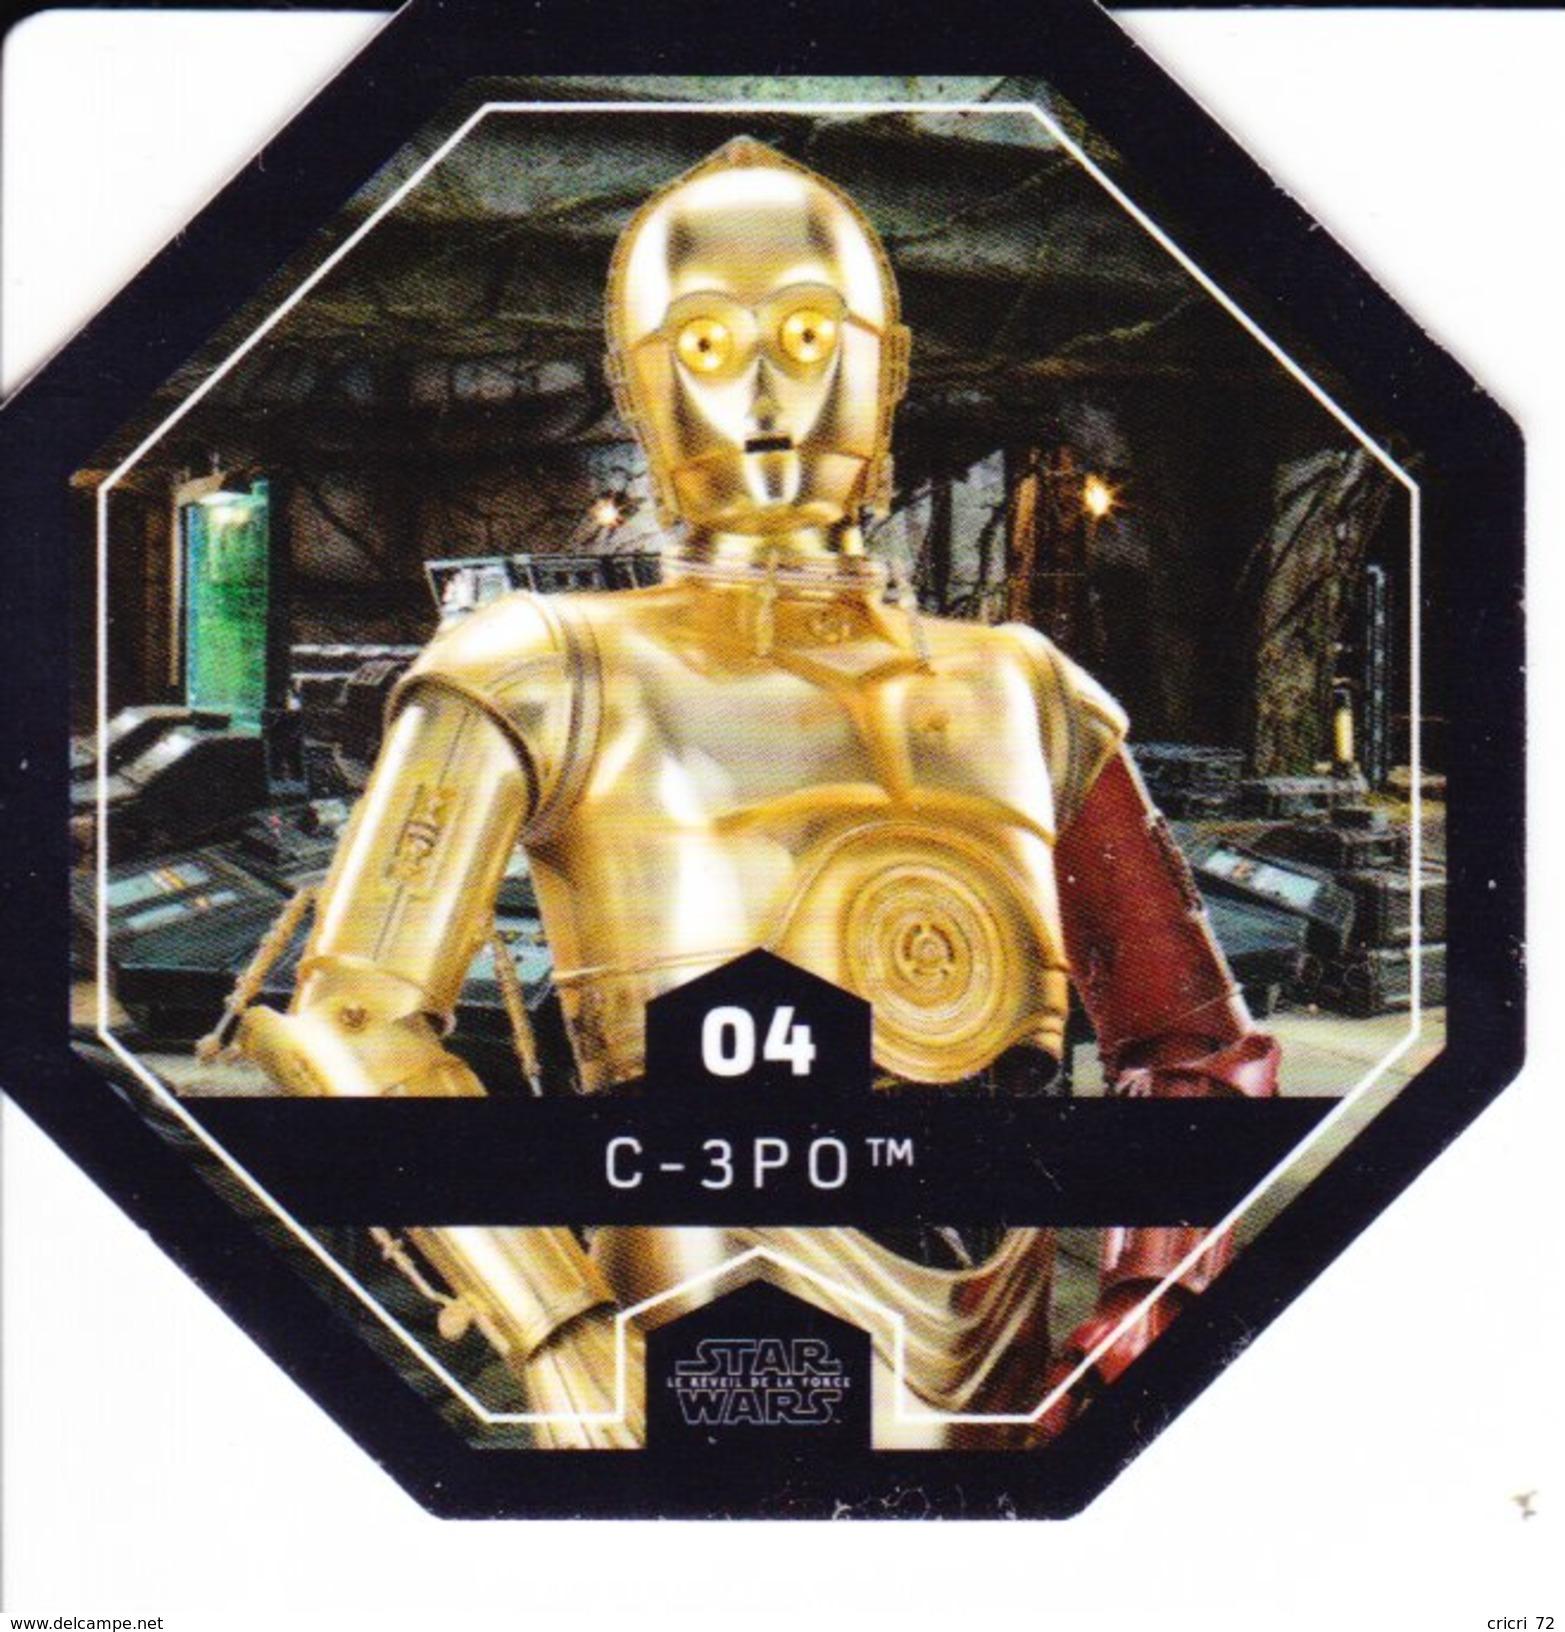 04 C-3 P O 2016 STAR WARS LECLERC COSMIC SHELLS - Episode II